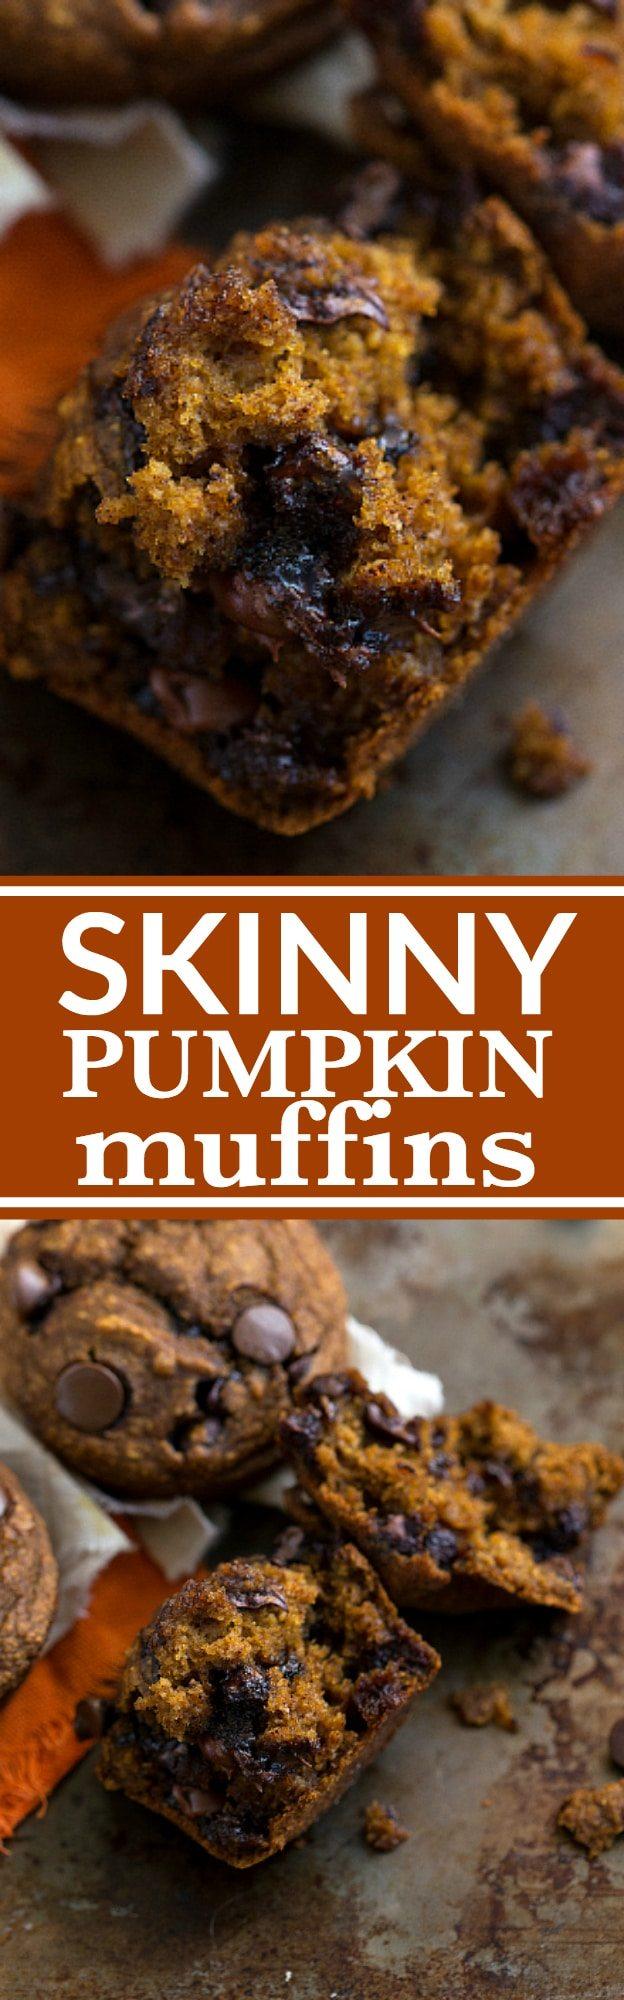 Low Calorie Pumpkin Chocolate Chip Muffins